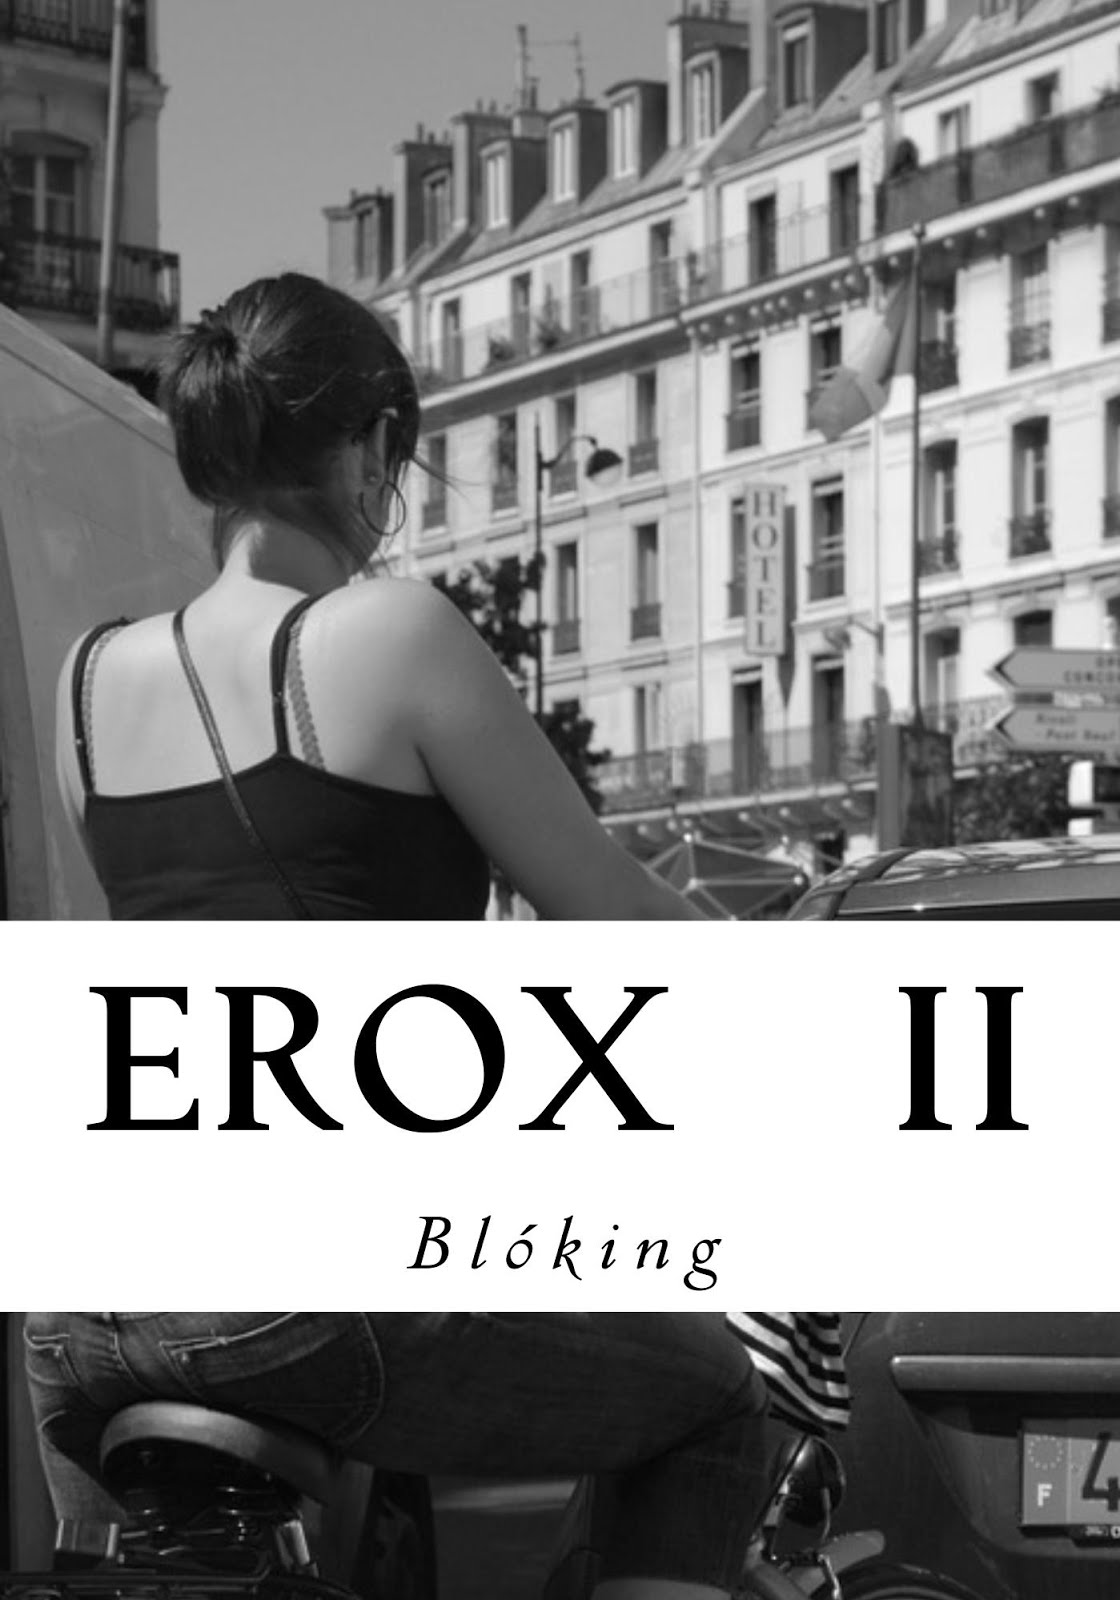 Erox II